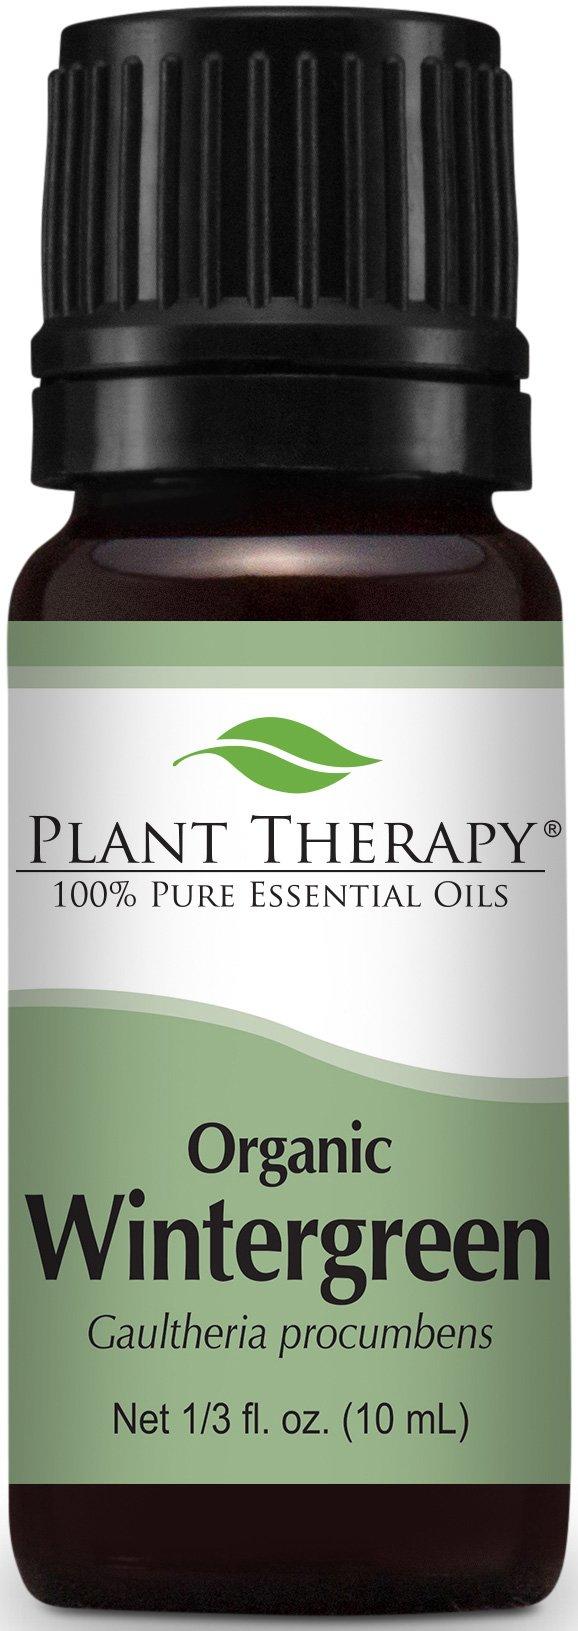 Plant Therapy USDA Certified Organic Wintergreen Essential Oil. 100% Pure, Undiluted, Therapeutic Grade. 10 ml (1/3 oz).